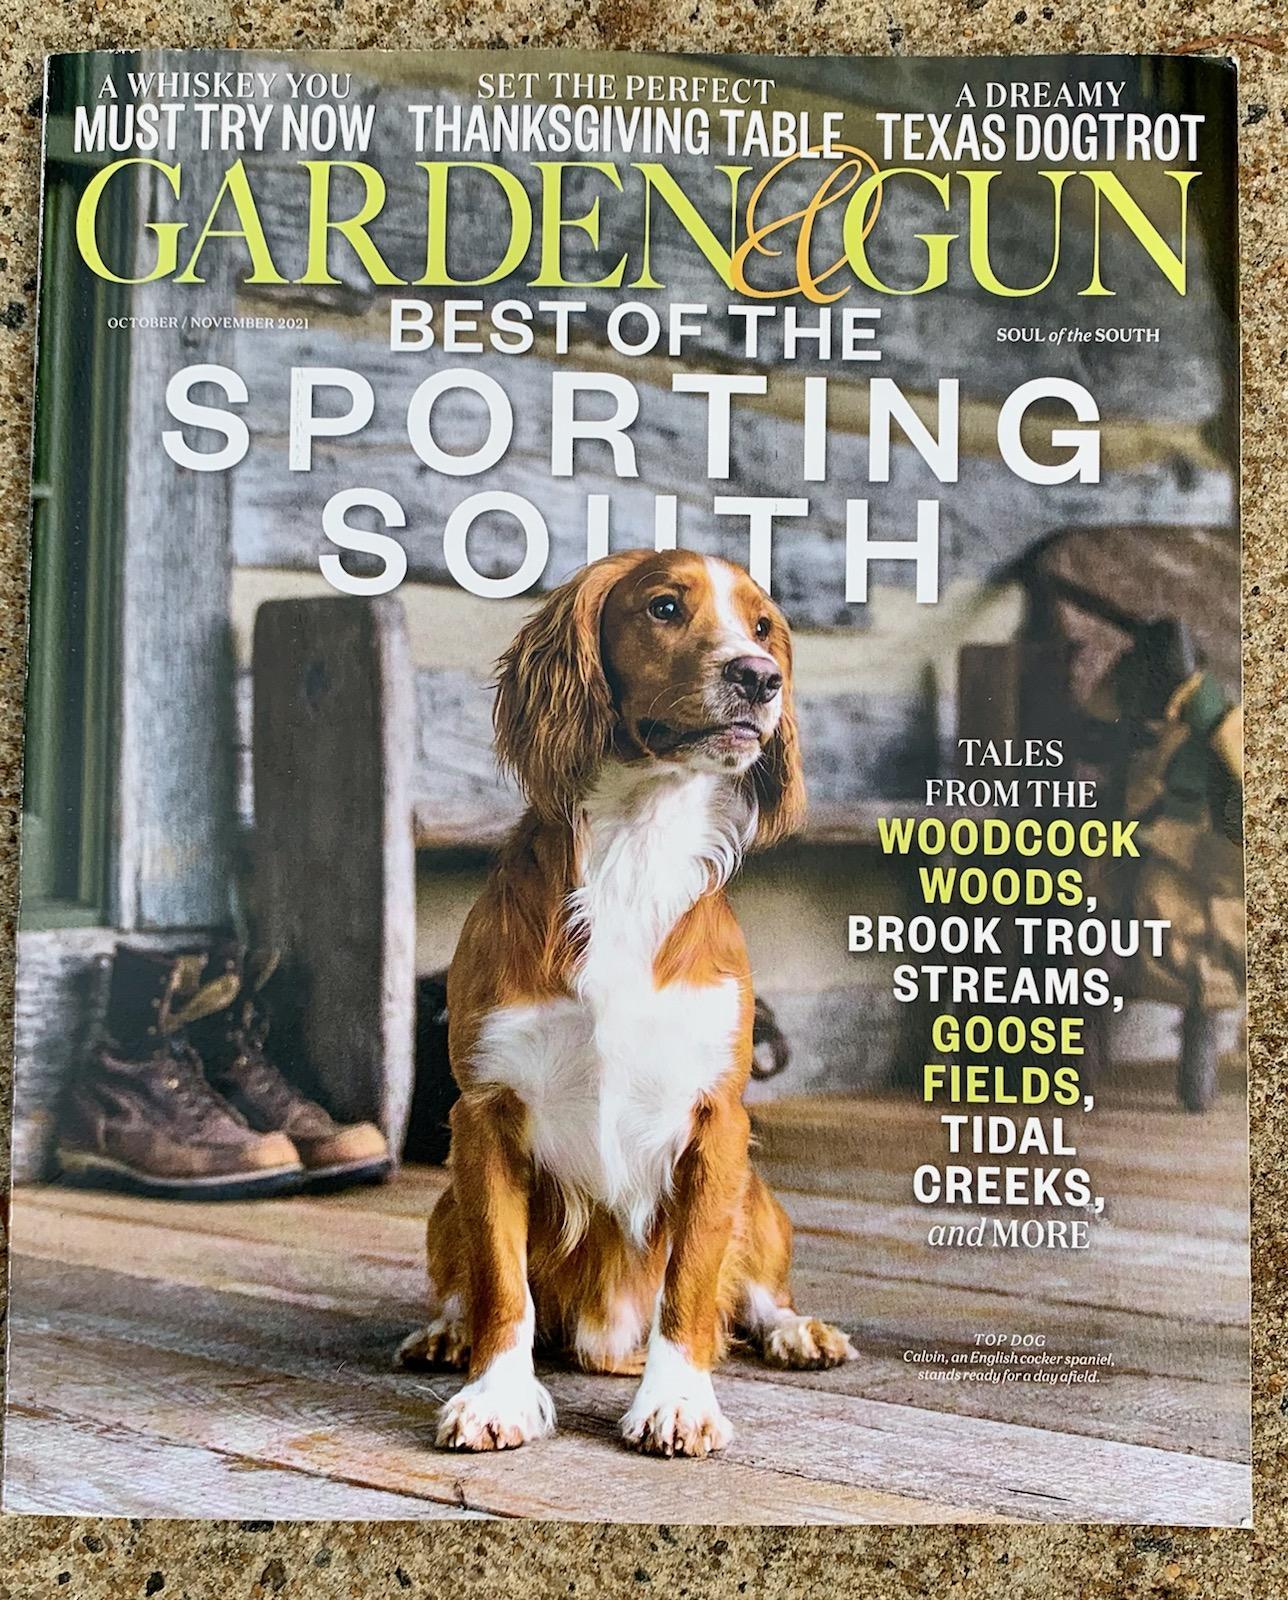 Garden and Gun - Article about Sundial